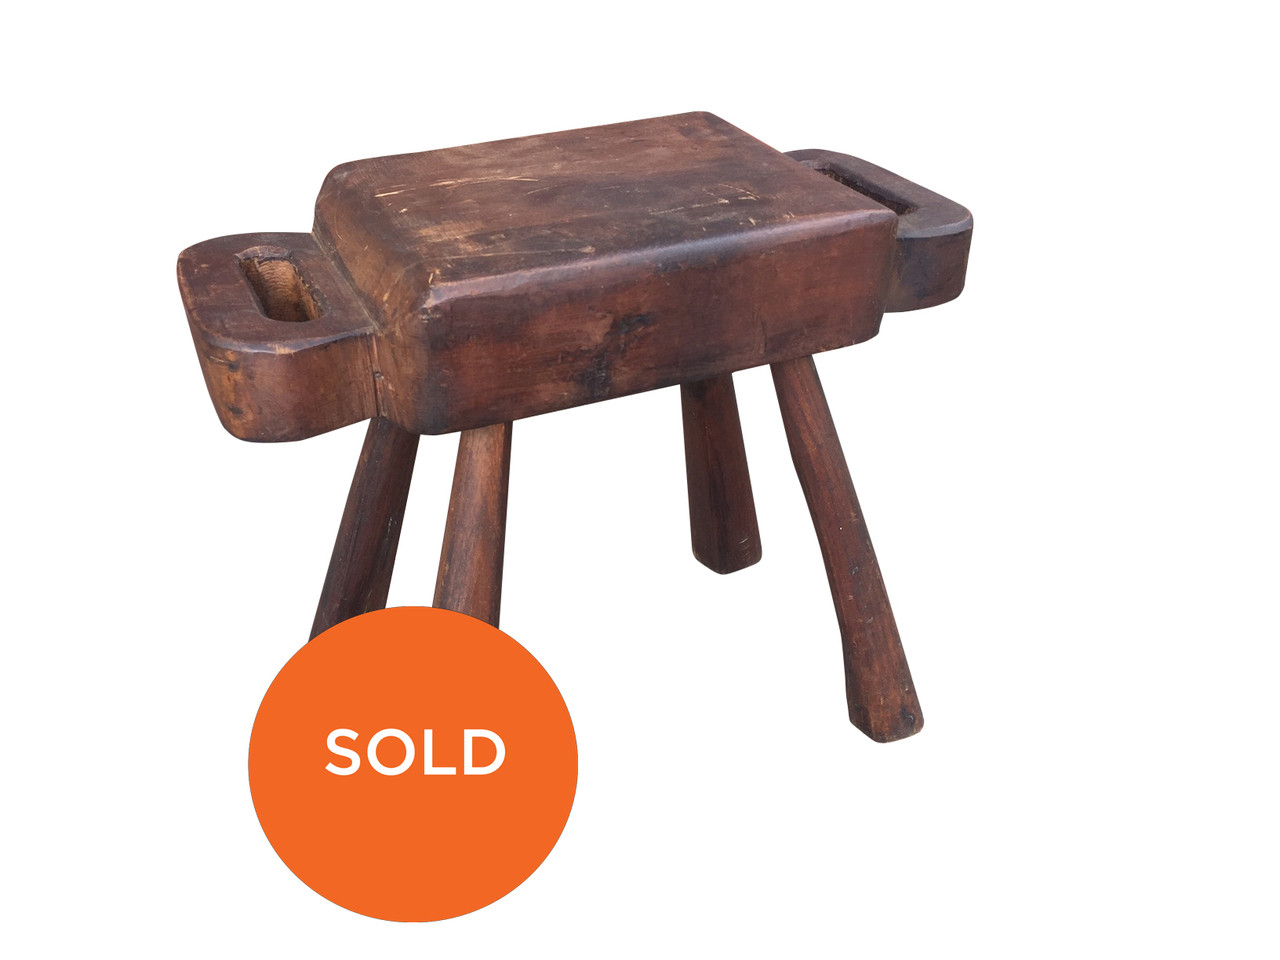 Pleasant Antique Primitive Wooden Milking Stool Opal Stackhouse Pabps2019 Chair Design Images Pabps2019Com